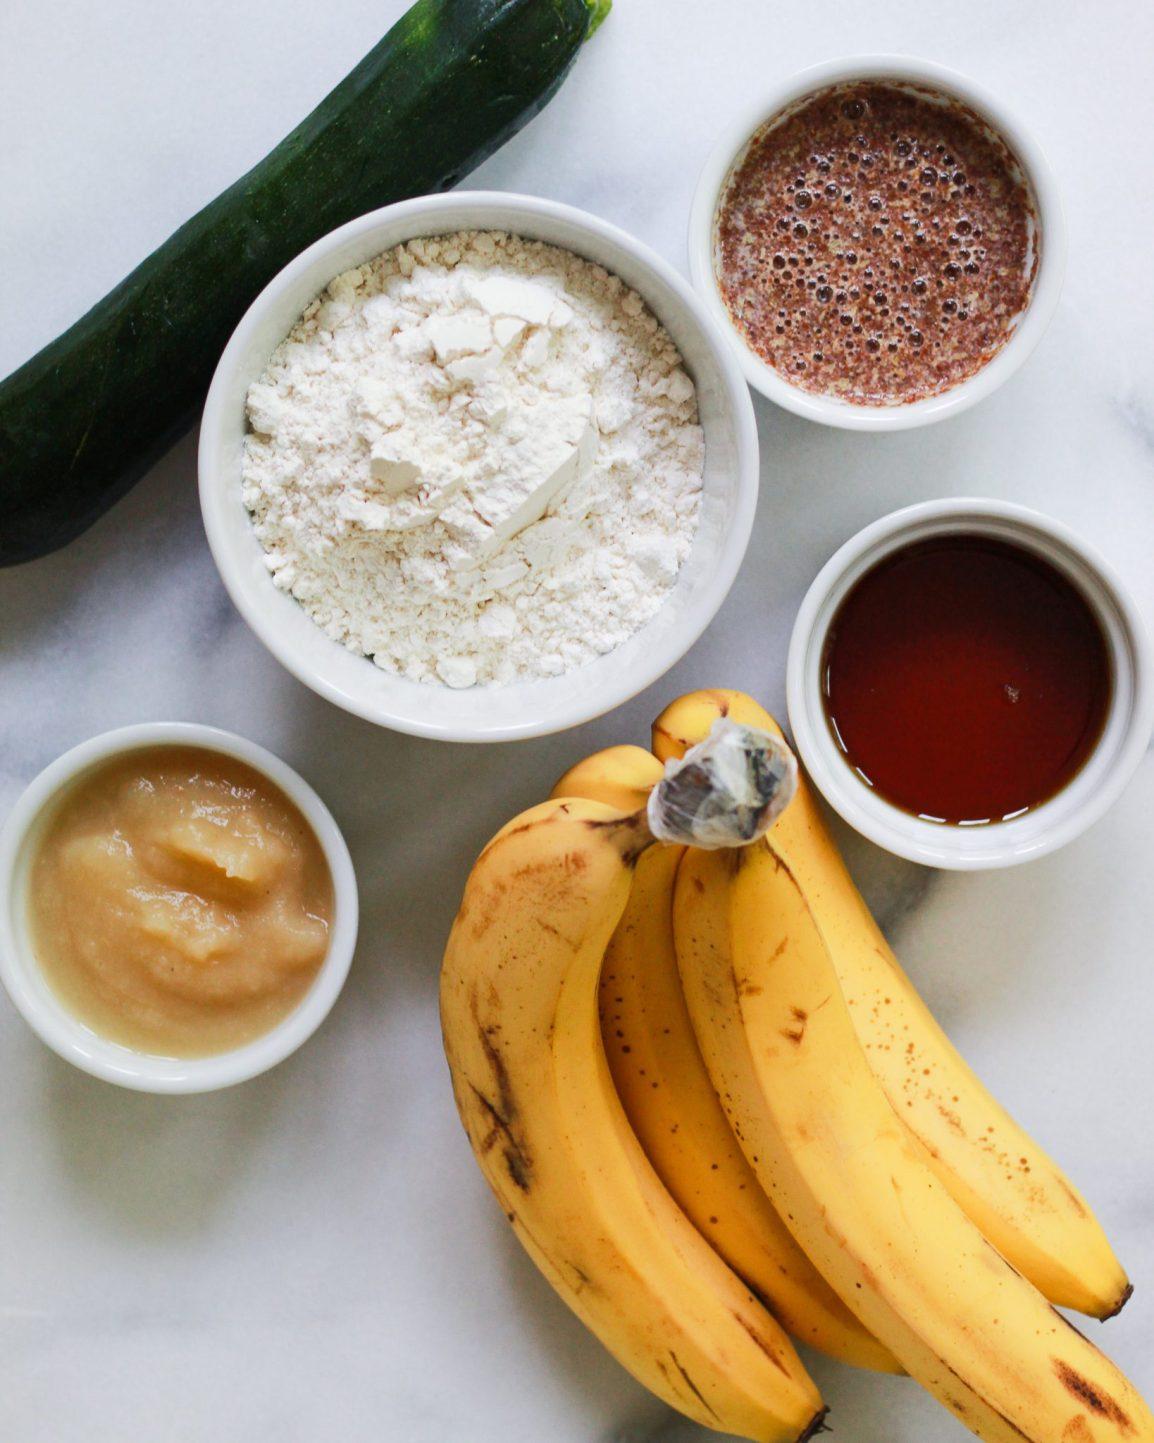 zucchini banana bread ingredients